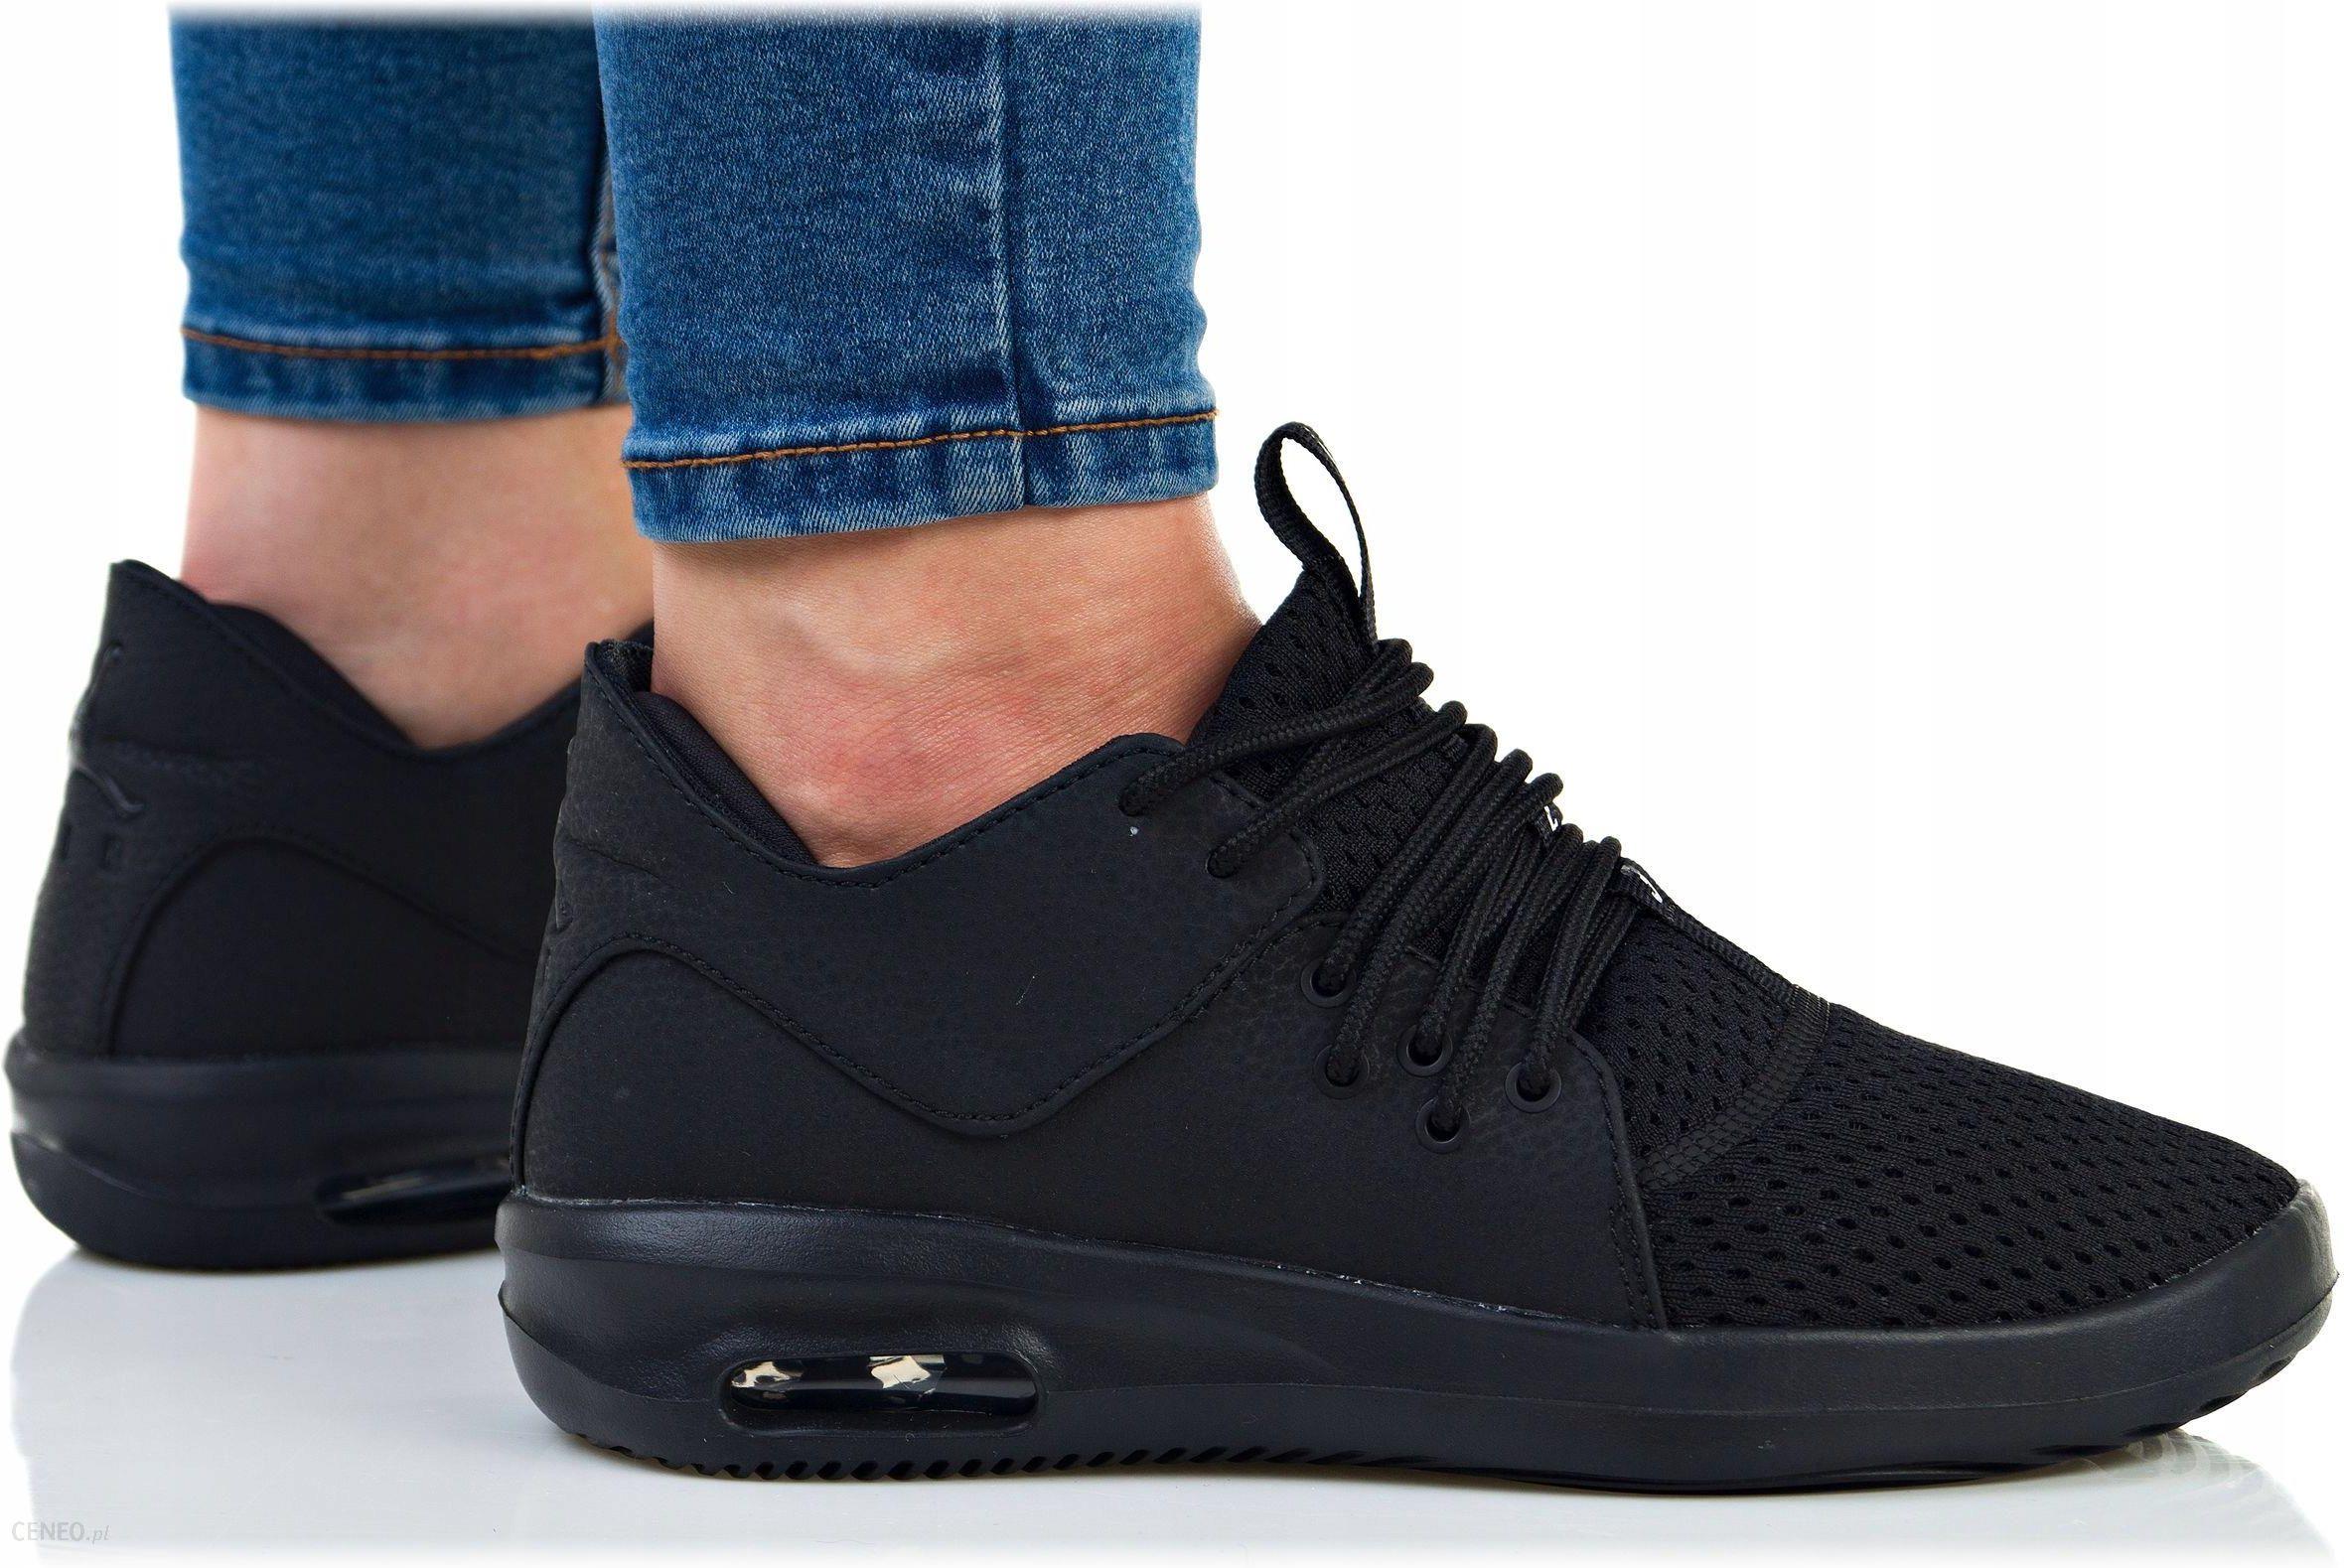 Buty First Class Nike Air Jordan (czarne) sklep online